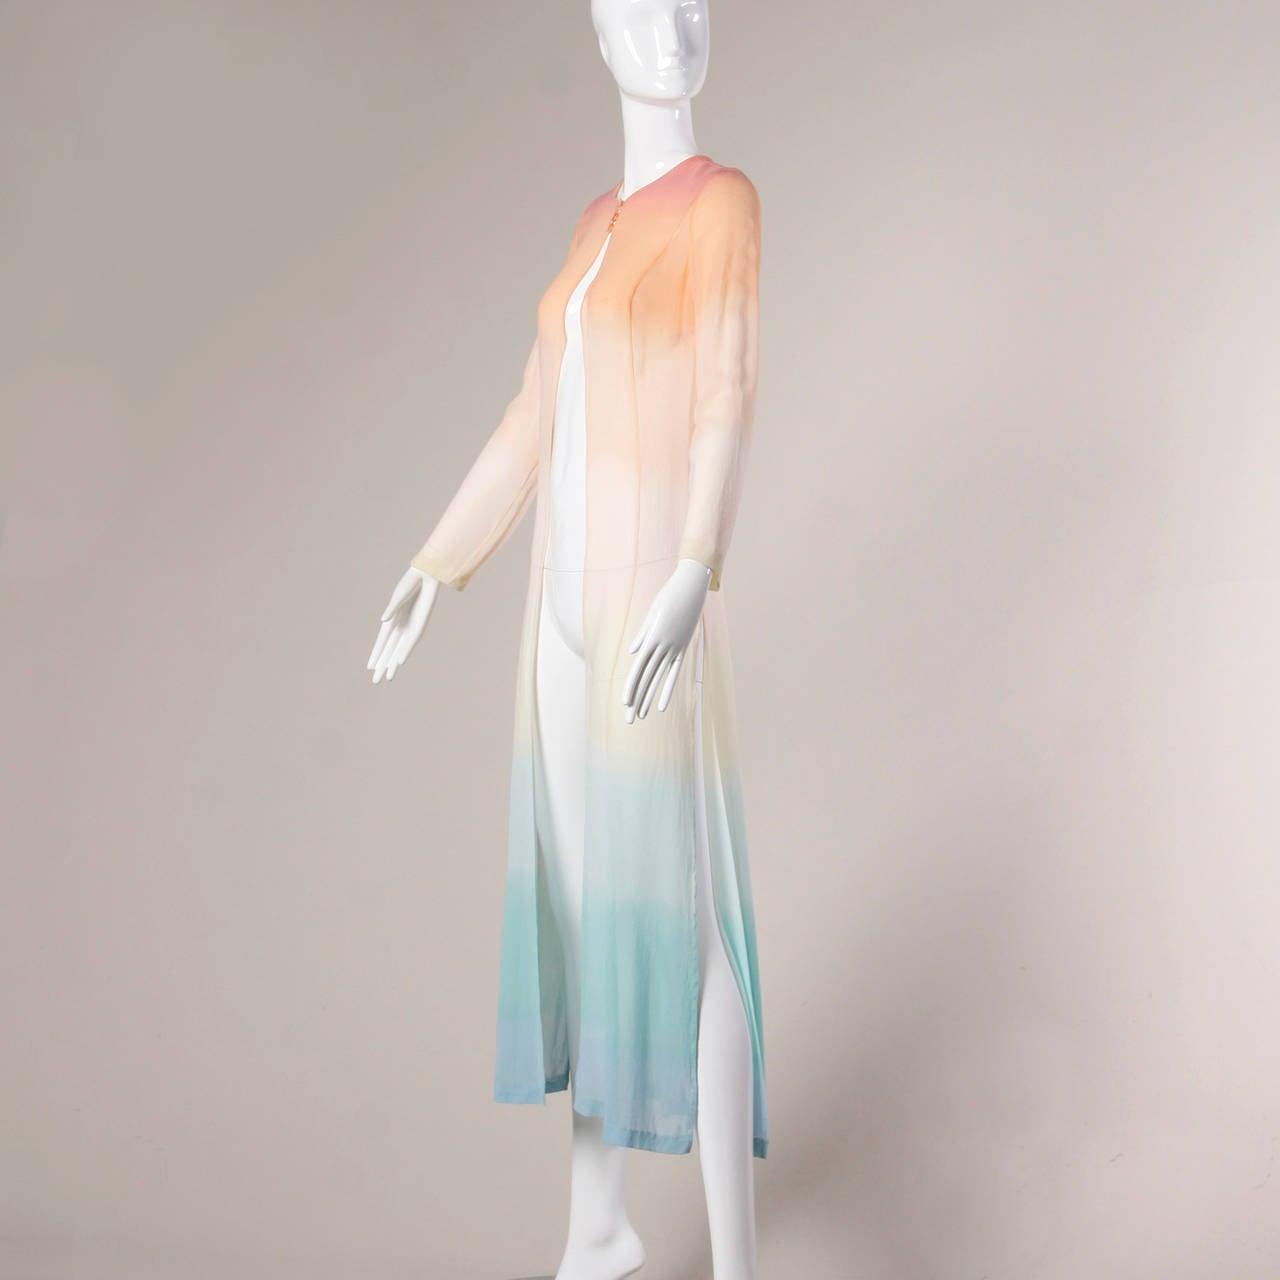 Louis Feraud Vintage Ombre Silk Kimono Duster or Maxi Coat 3